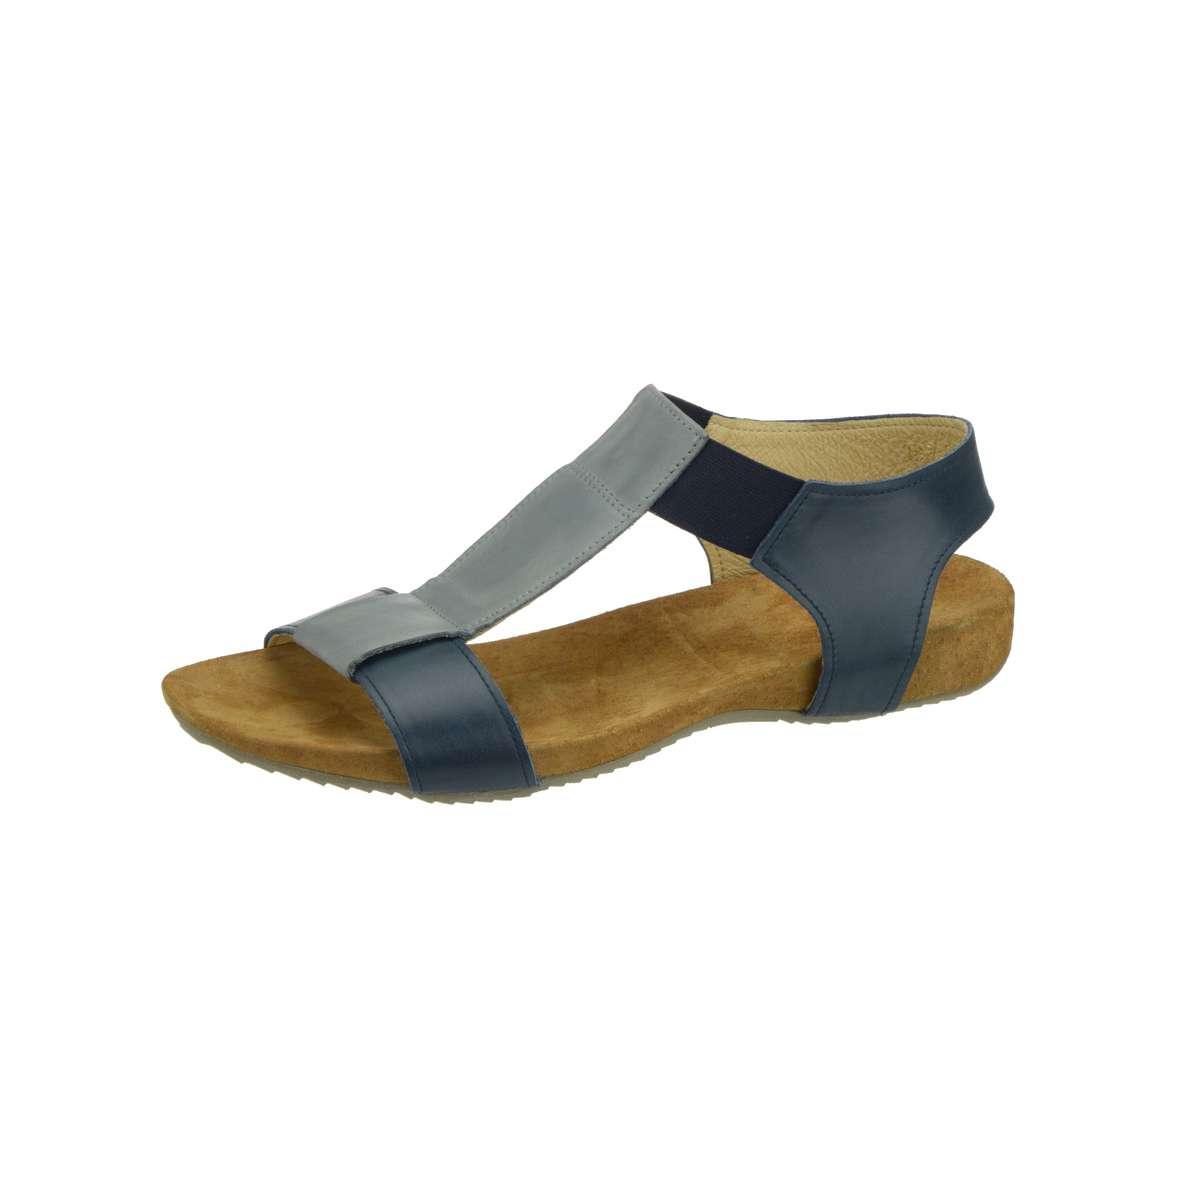 Dámská vycházková sandálka AA 387-36 - PEON c8aa10b39d